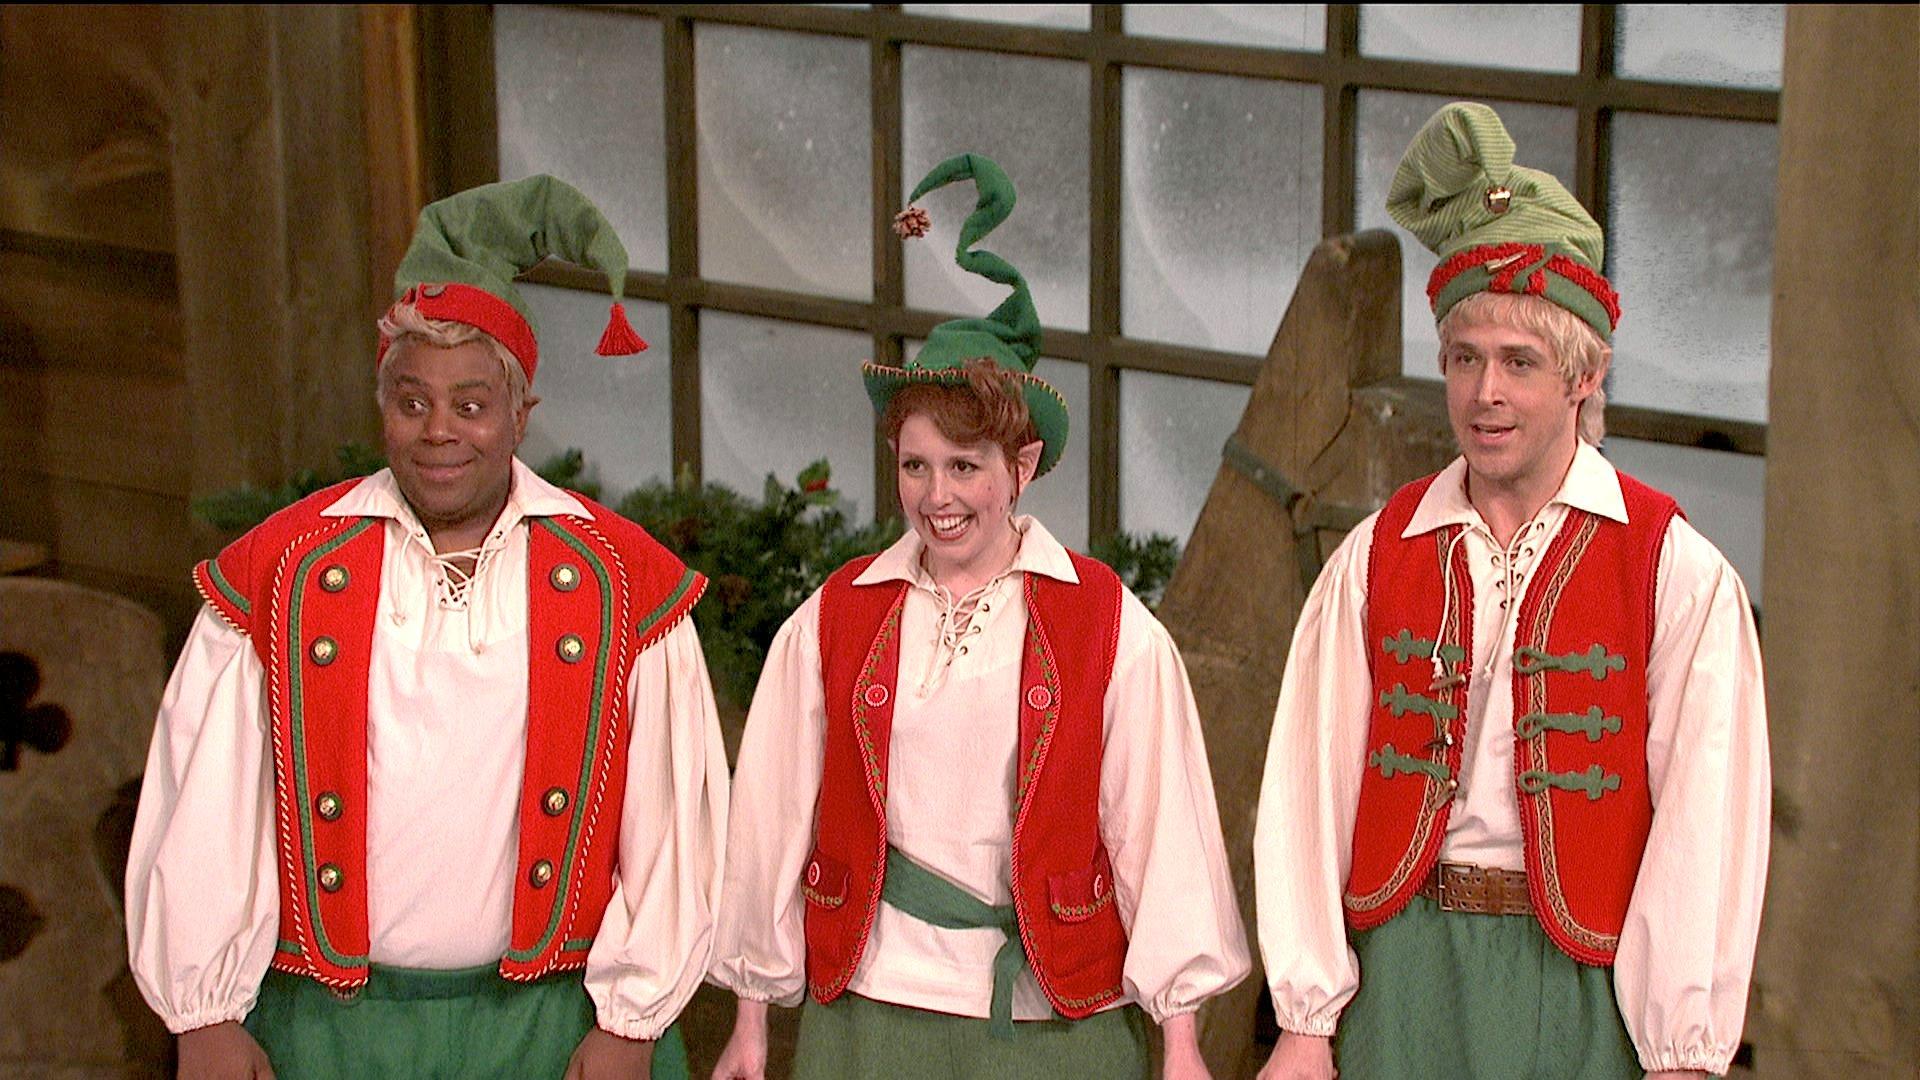 Watch Santa & The Elves From Saturday Night Live - NBC.com